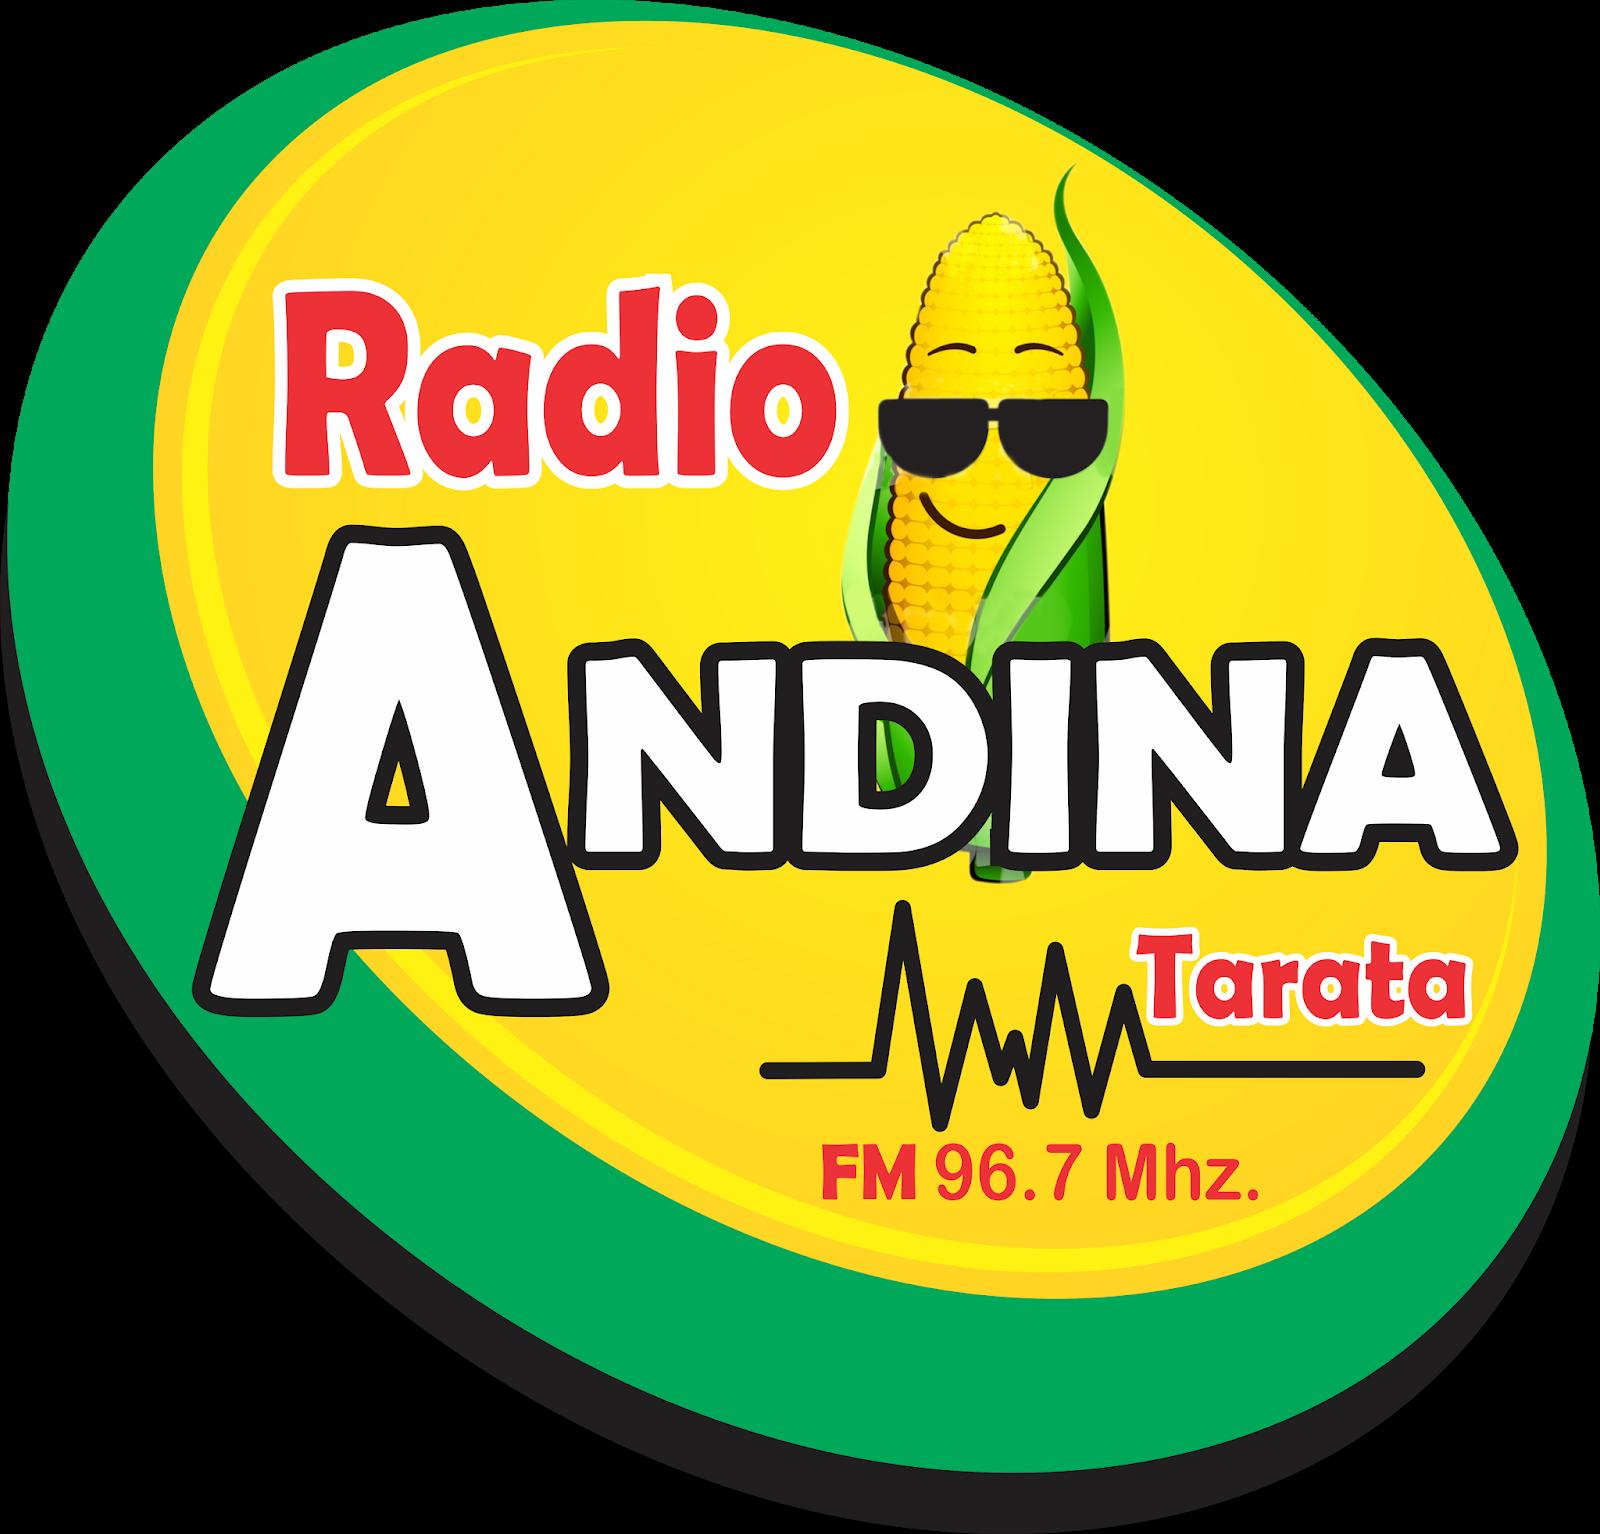 RADIO ANDINA GTARATA